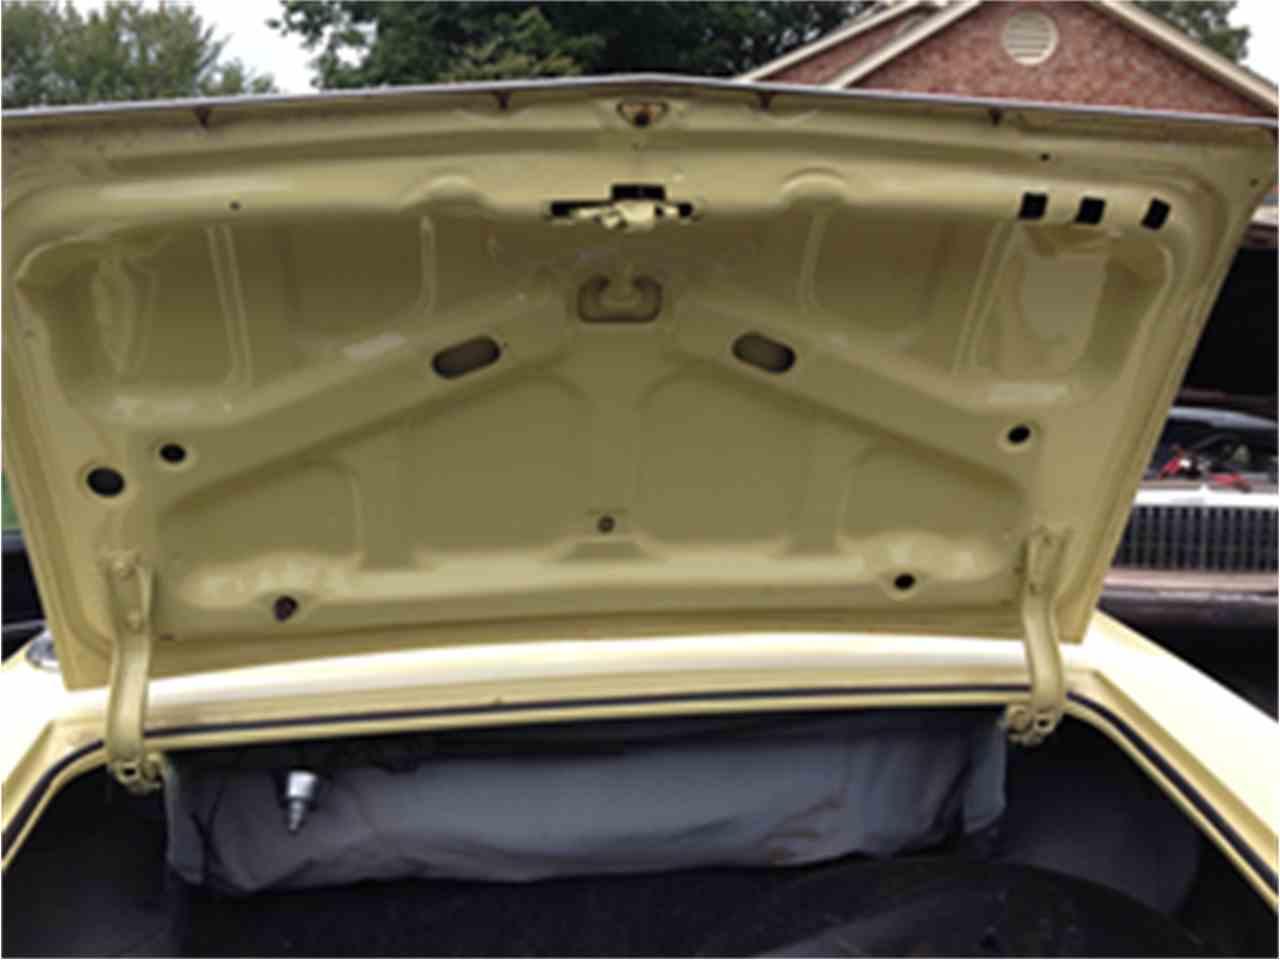 Large Picture of '70 Buick Skylark located in Oakton Virginia - $13,500.00 - ESQY